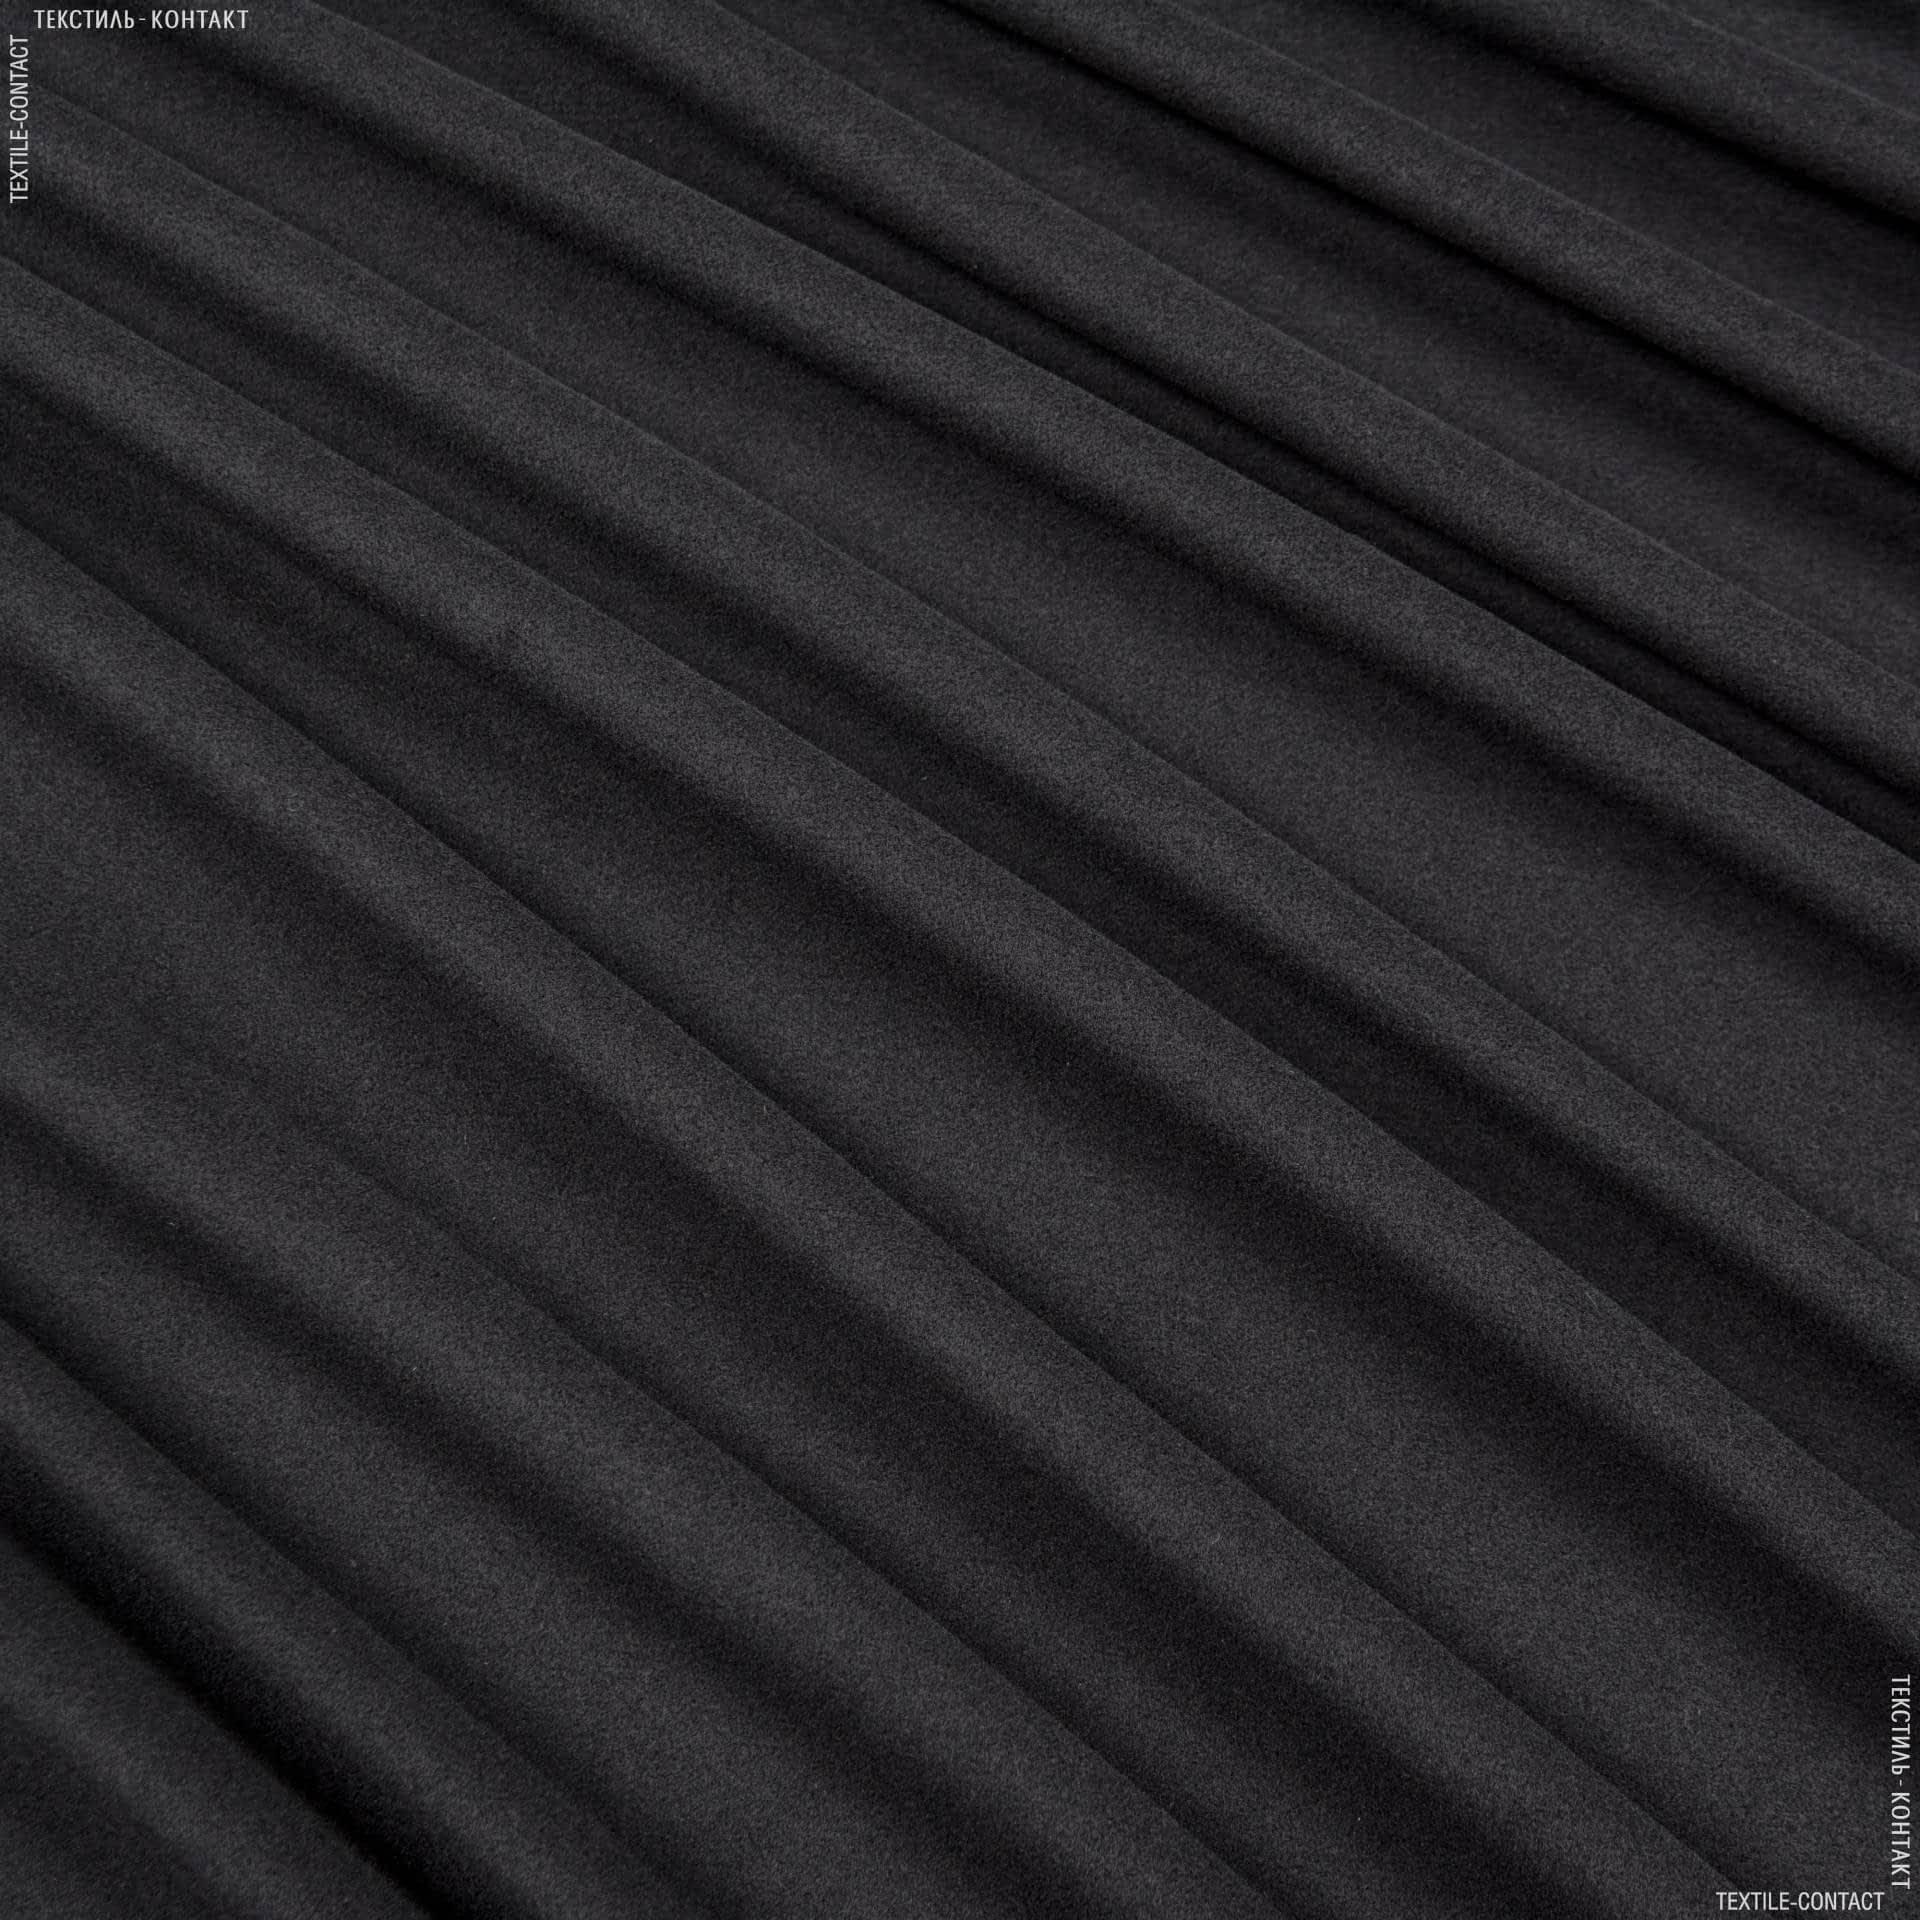 Тканини для верхнього одягу - Пальтова масконi темно-сірий